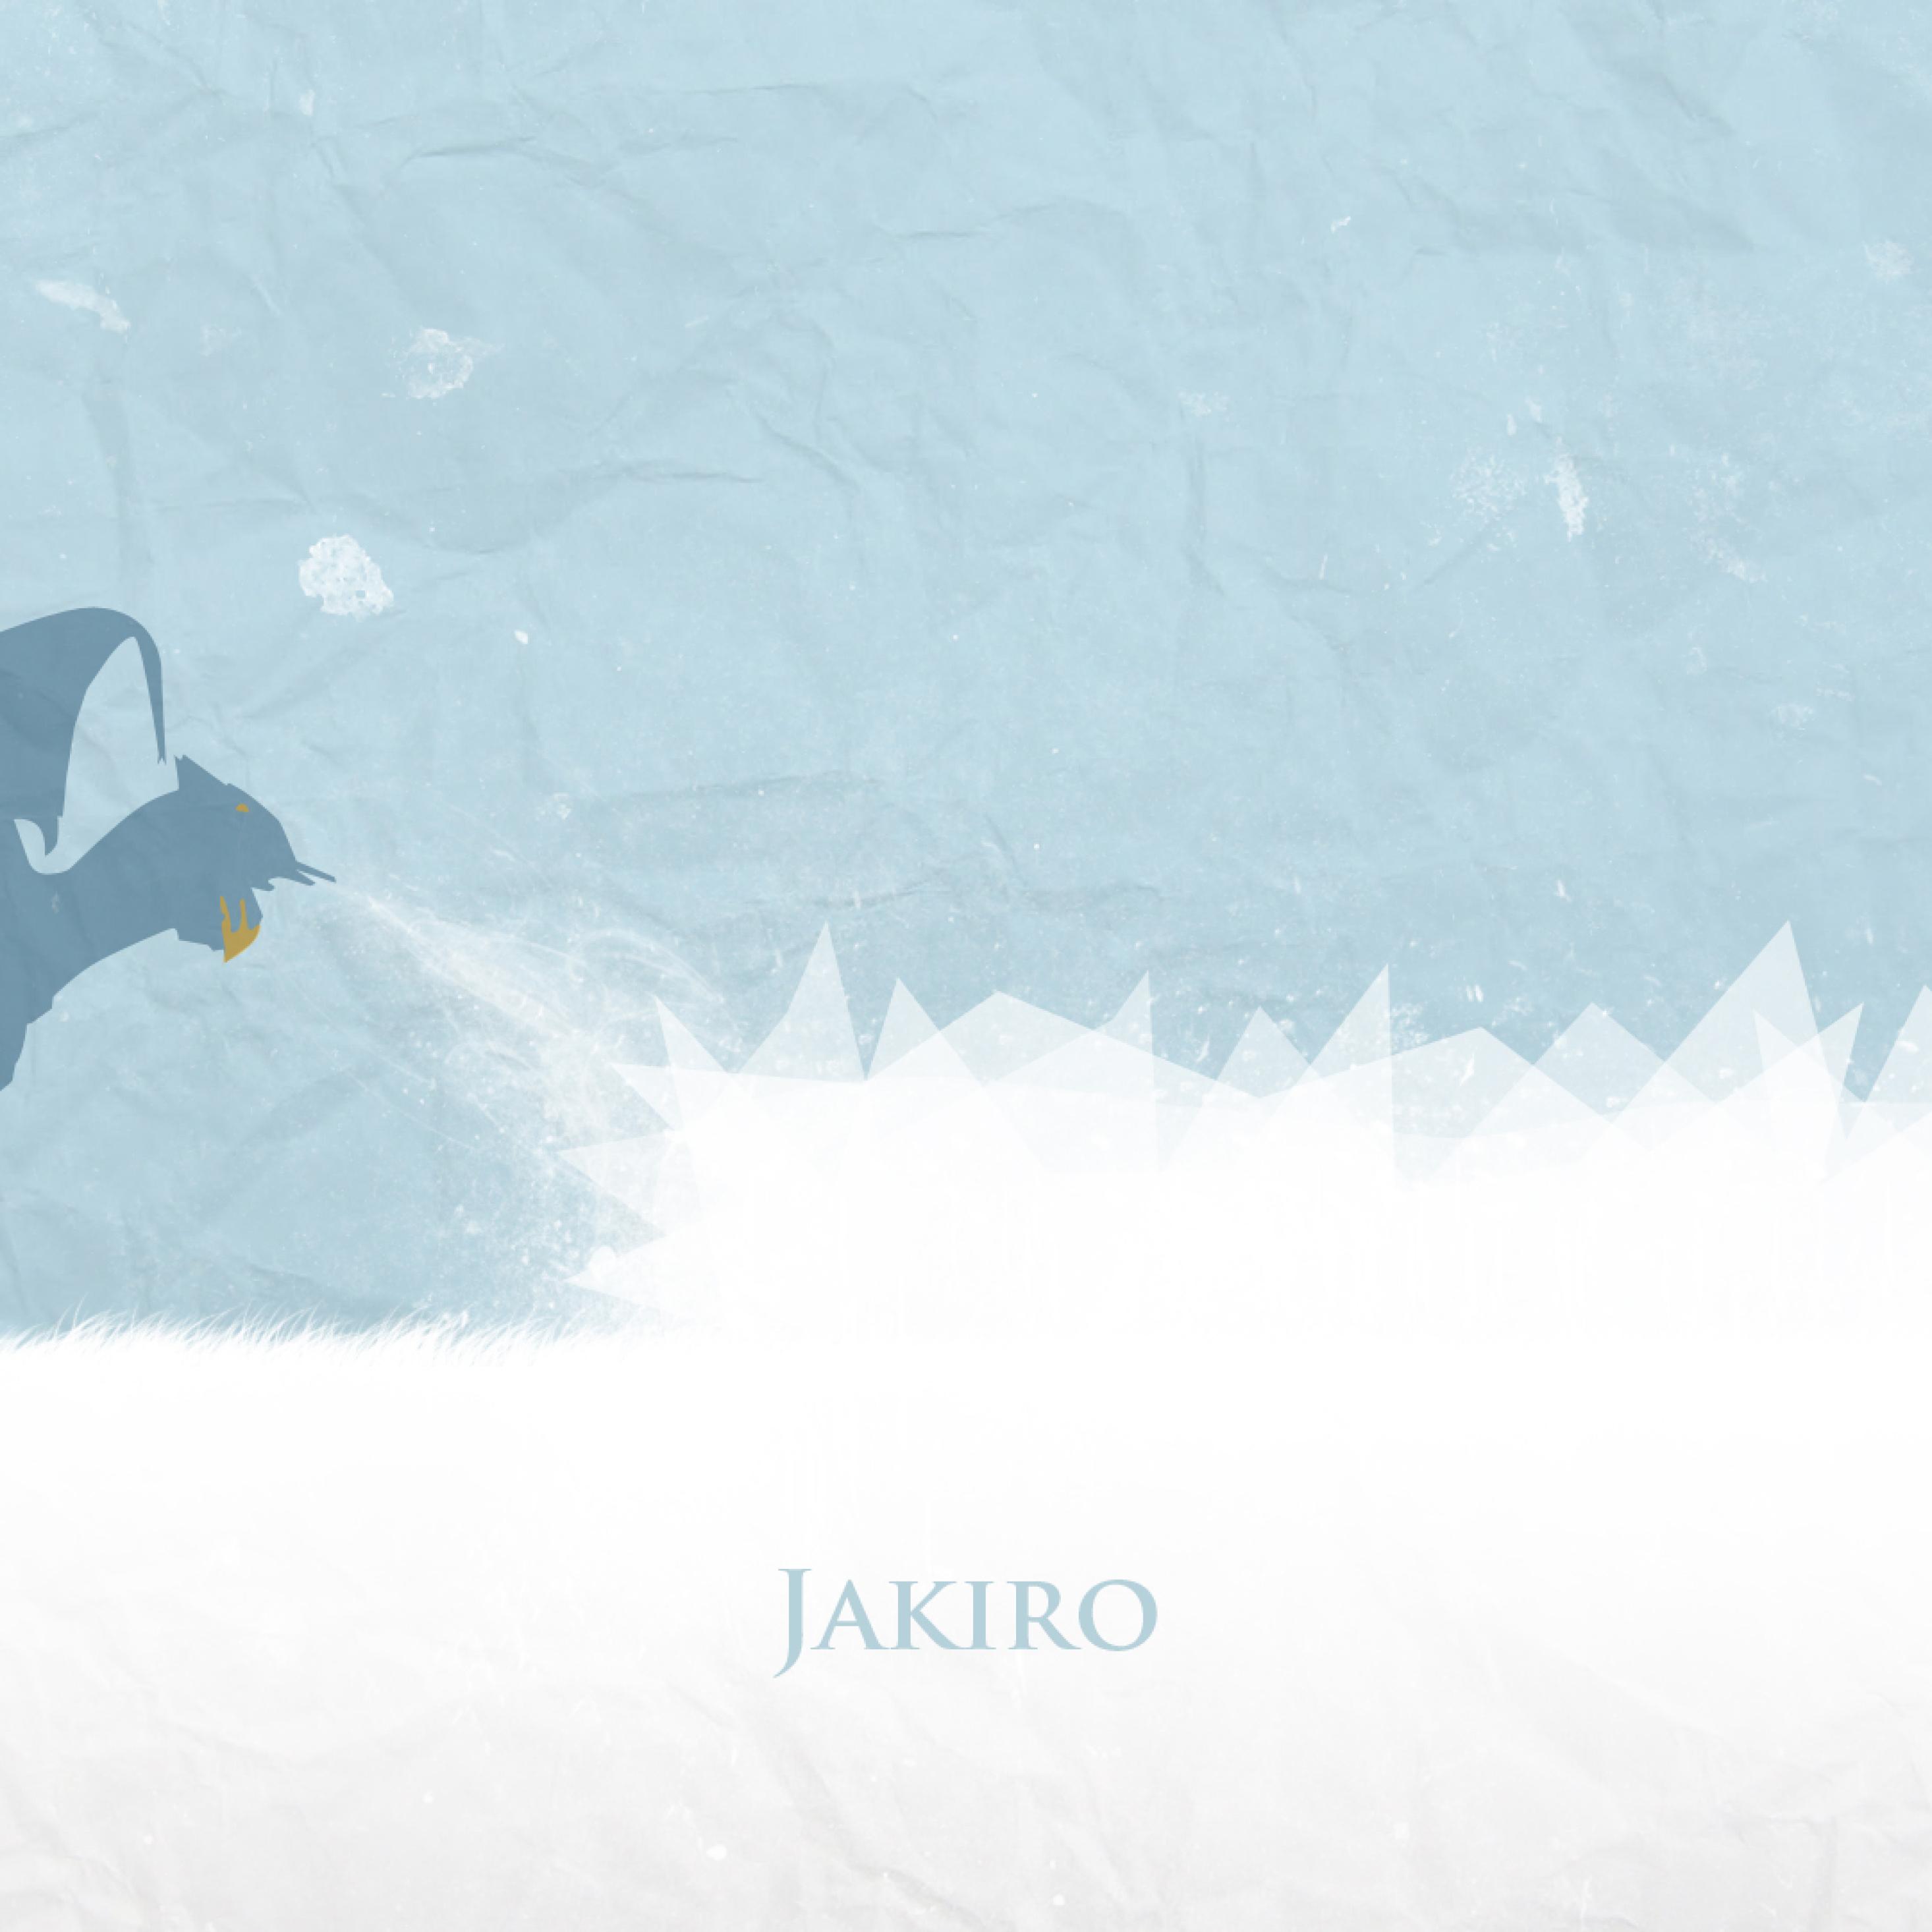 2932x2932 Jakiro Dota 2 Art Ipad Pro Retina Display Wallpaper Hd Games 4k Wallpapers Images Photos And Background